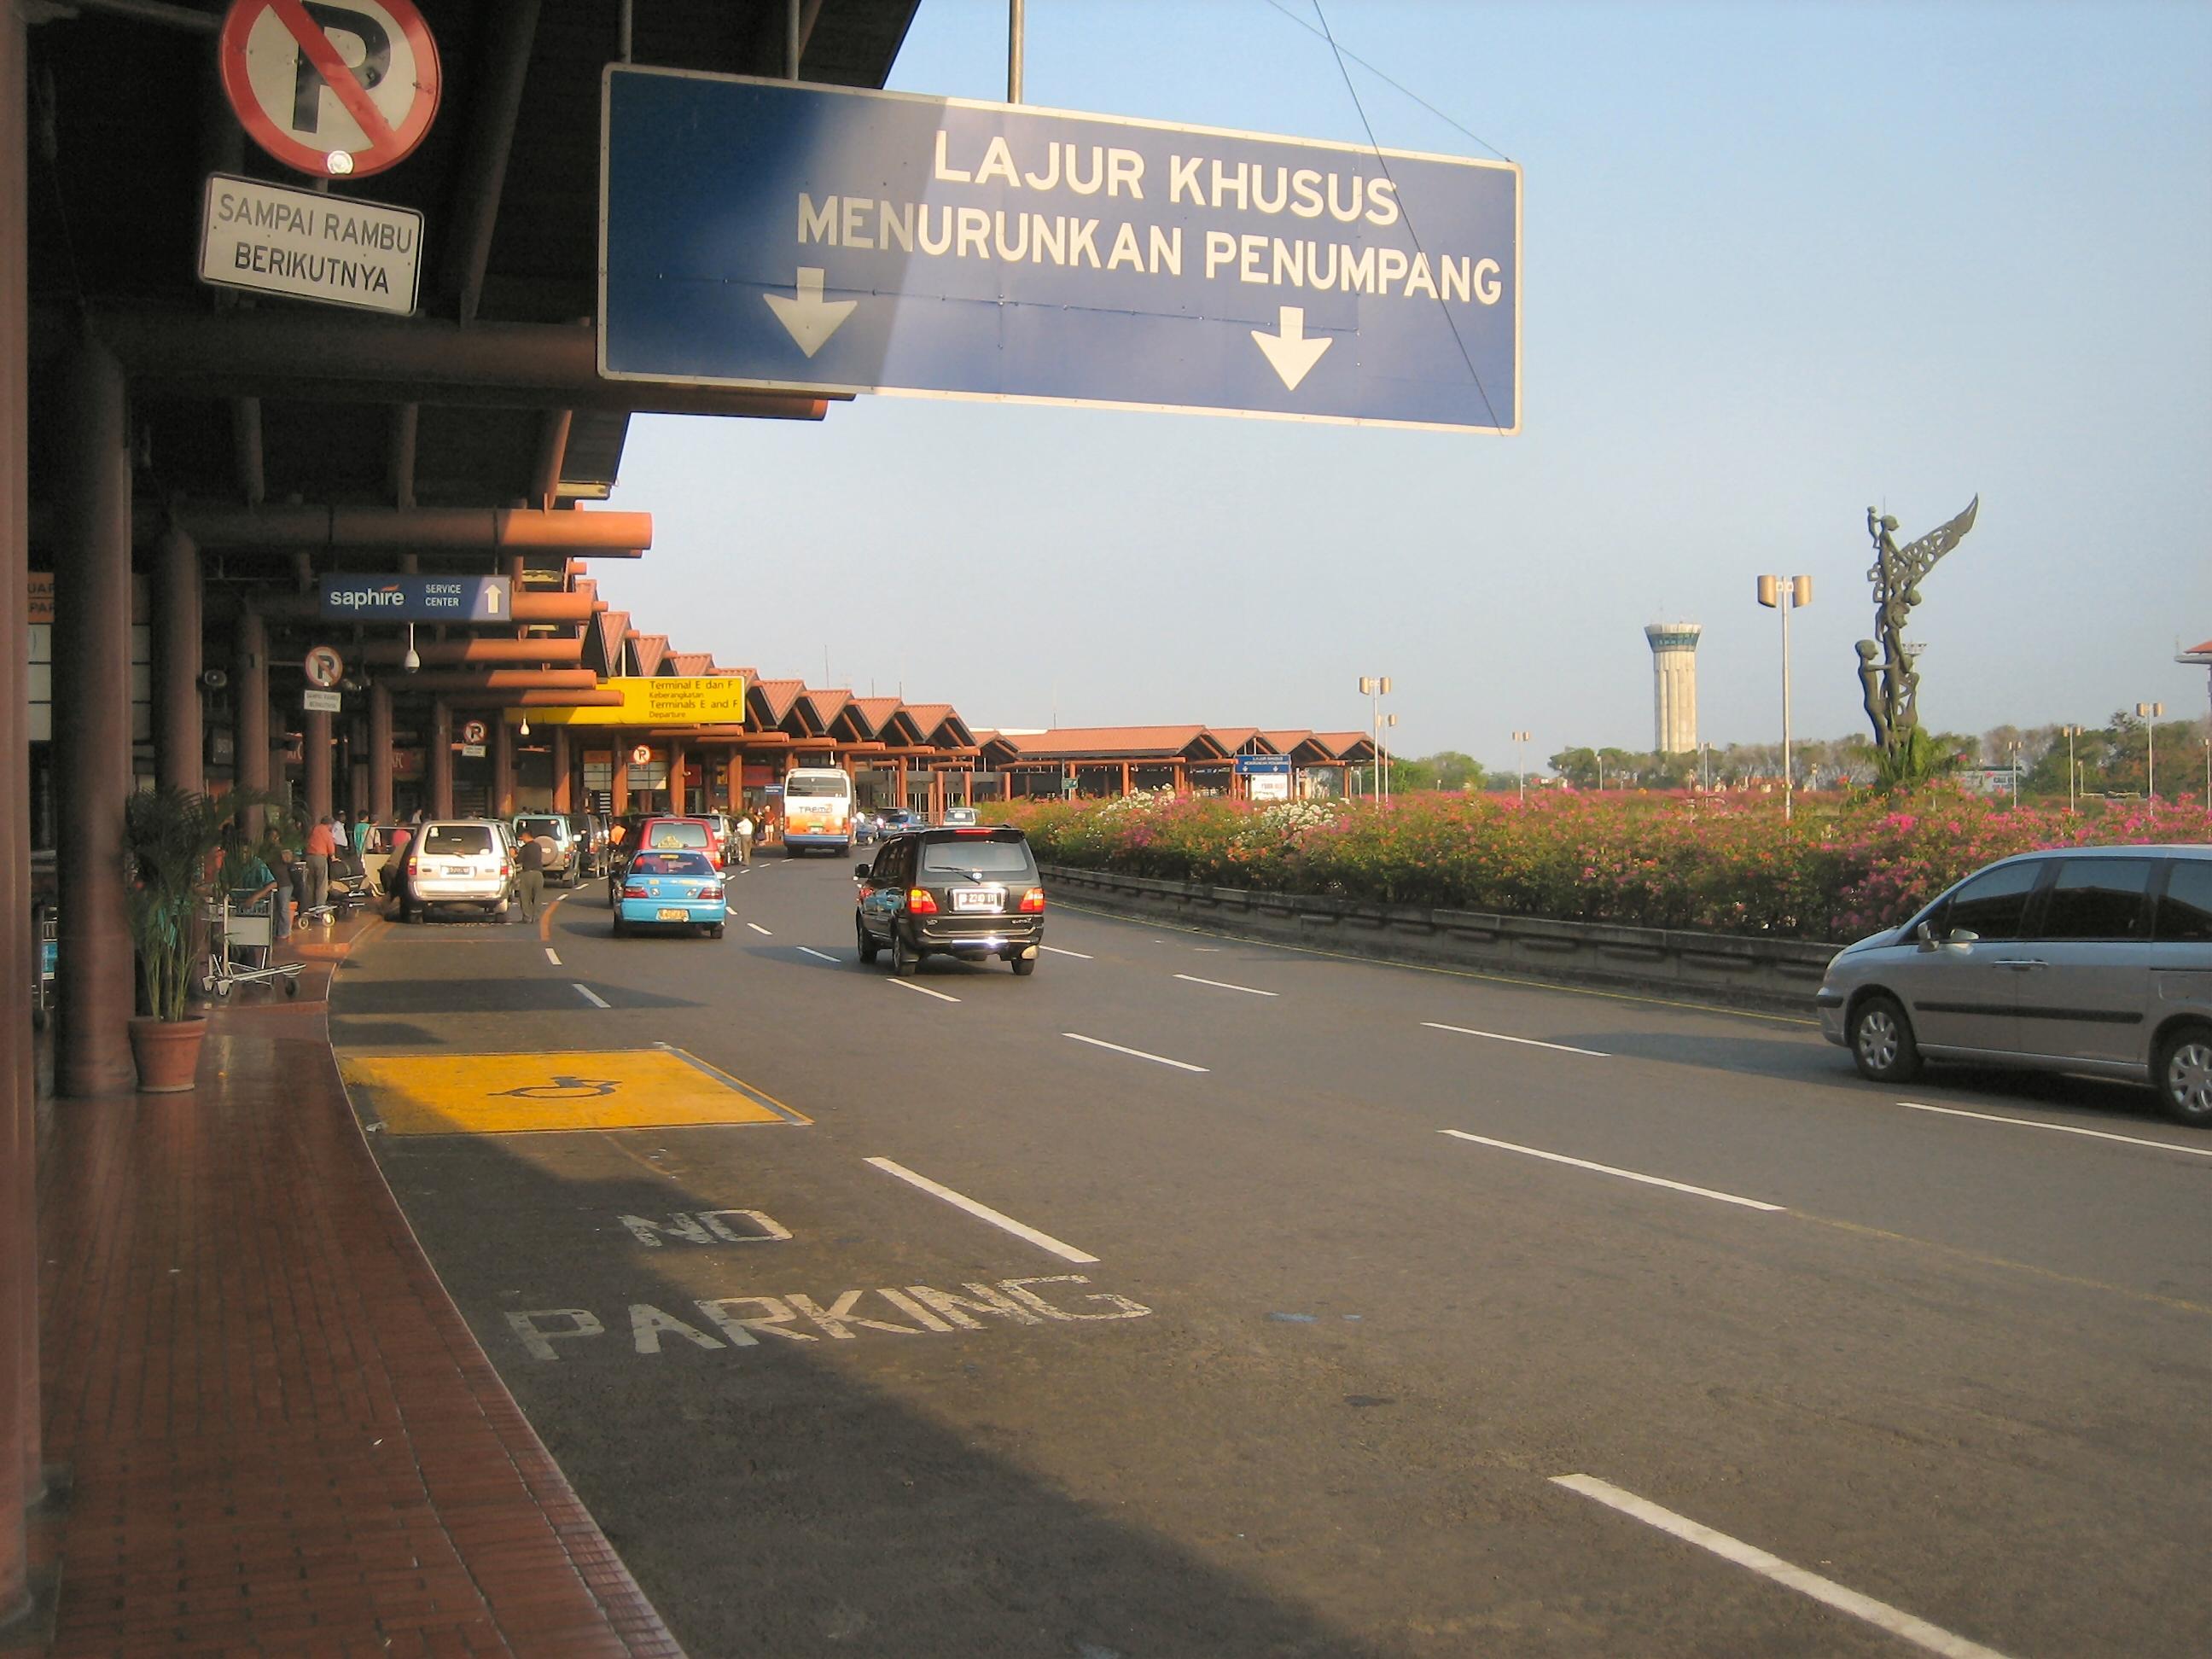 Jakarta Barat ke Bandara Soekarno Hatta - New Airport Bus ...